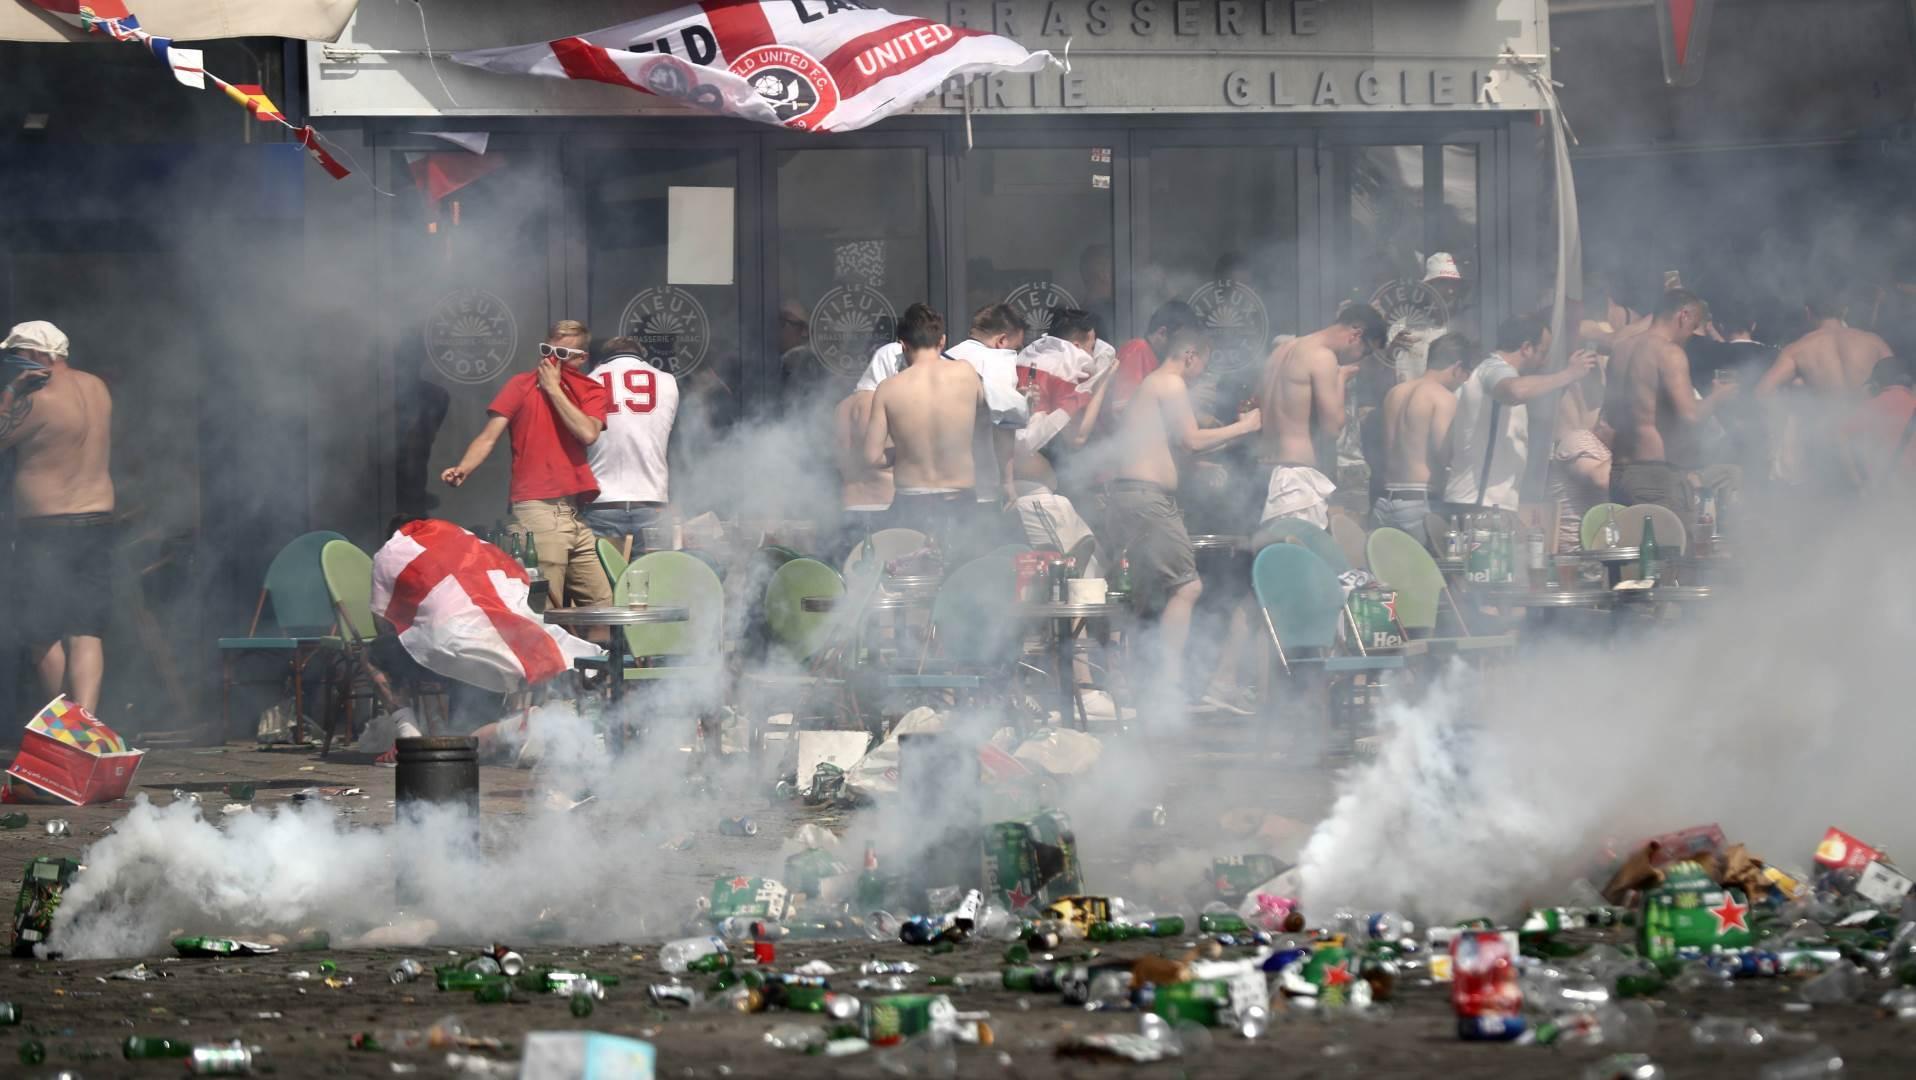 engleska, navijači, englezi, rasistik